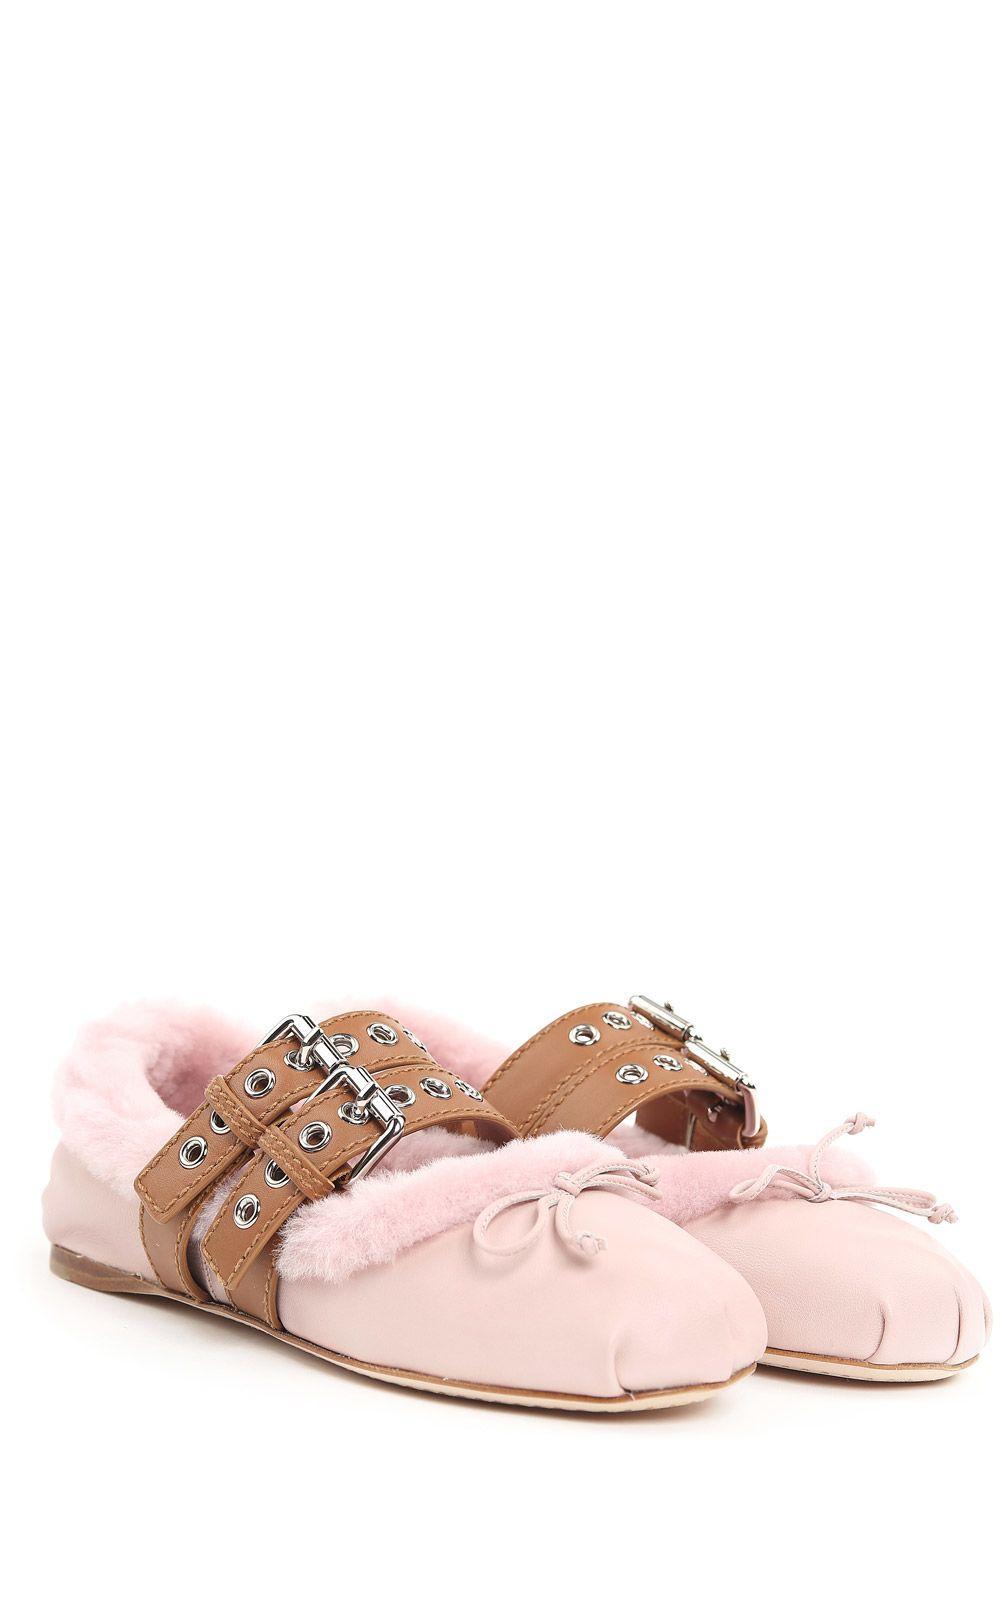 Miu Miu Leather And Shearling Ballet Flats In Rosa